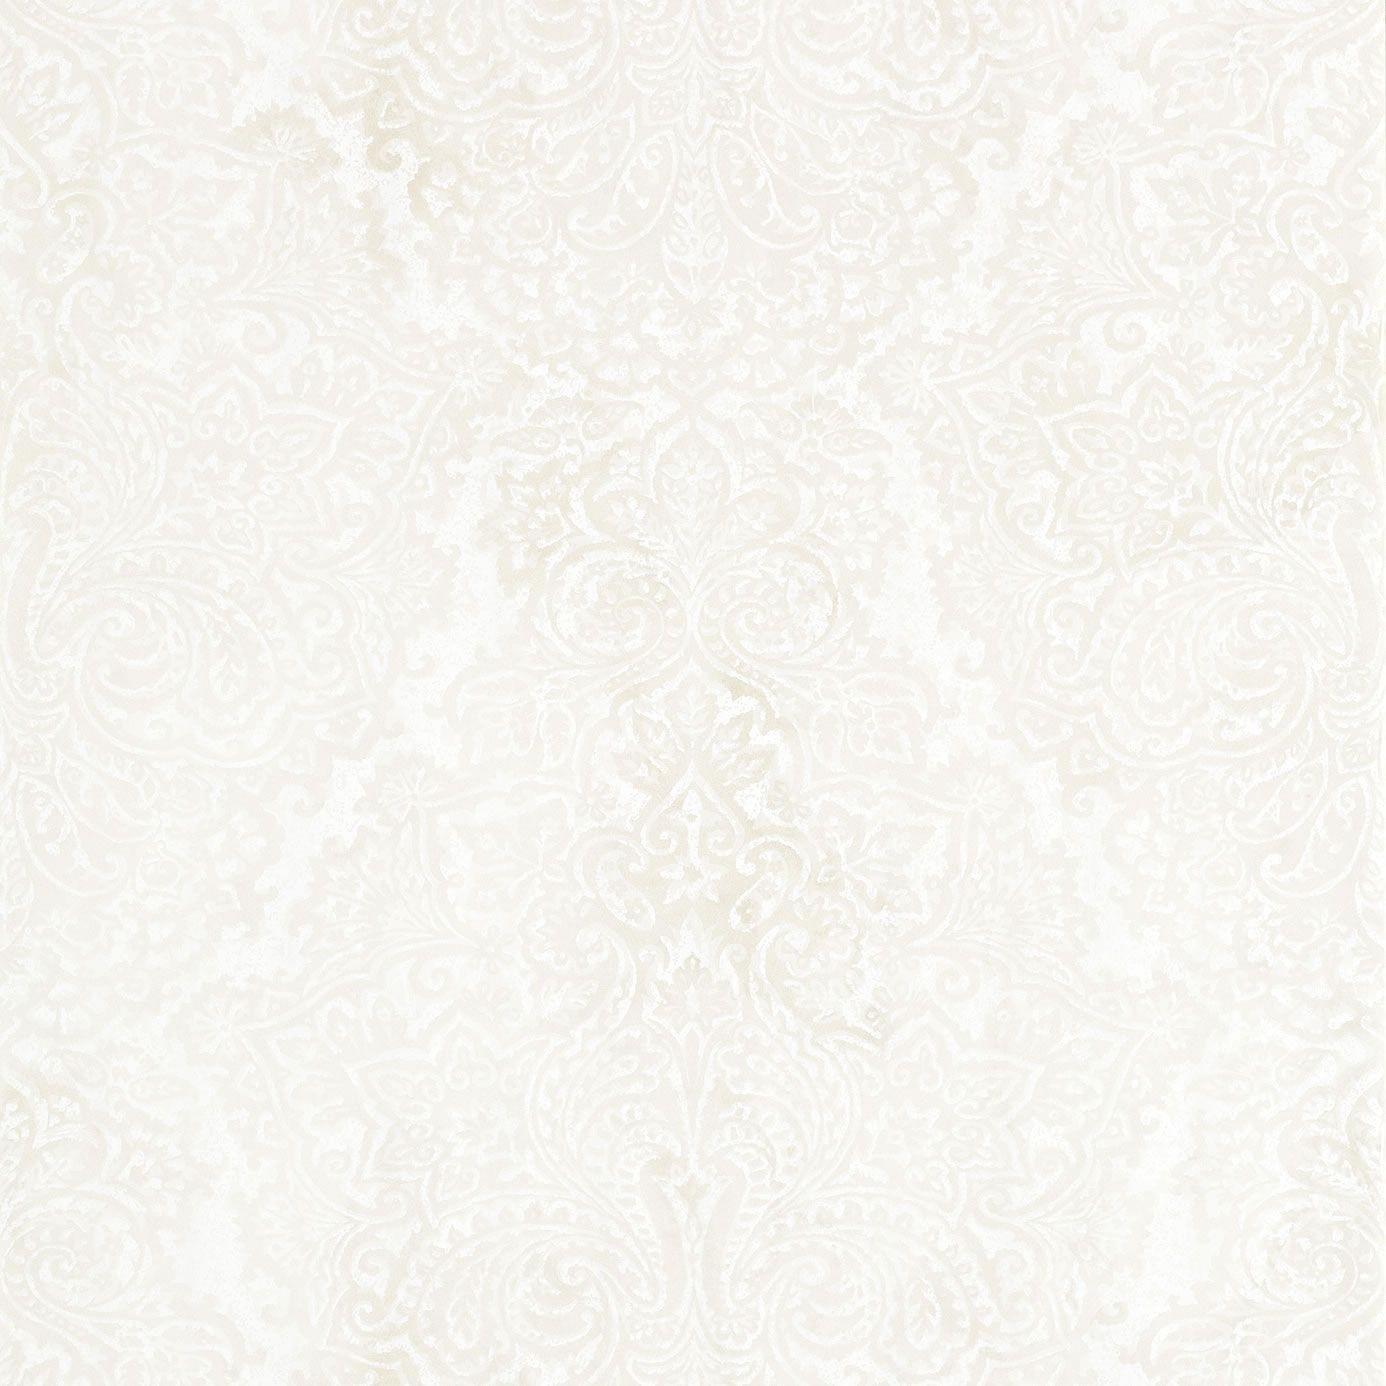 Pearl Opal White   110639   Aurelia   Leonida   Harlequin Wallpaper 1386x1386